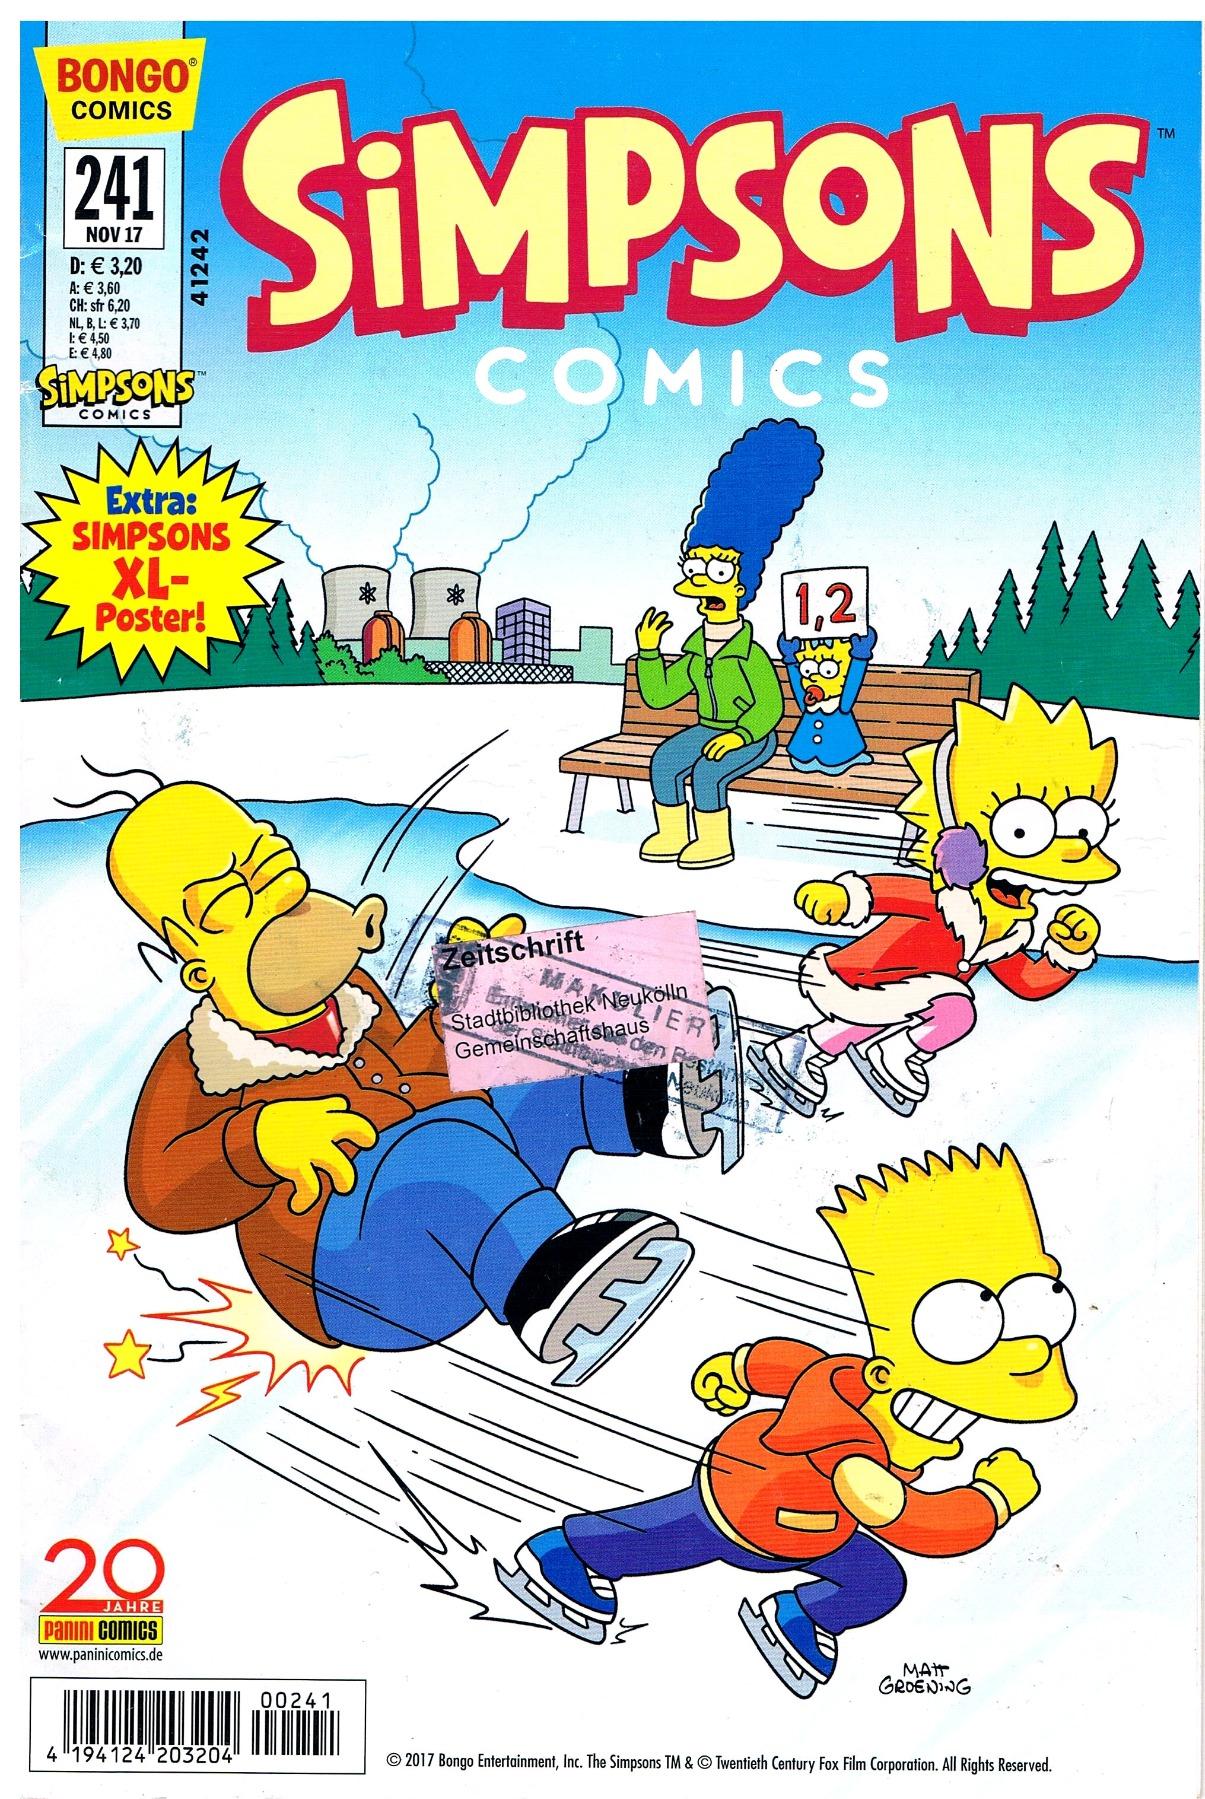 Simpsons Comics Heft Ausgabe Nov 2017